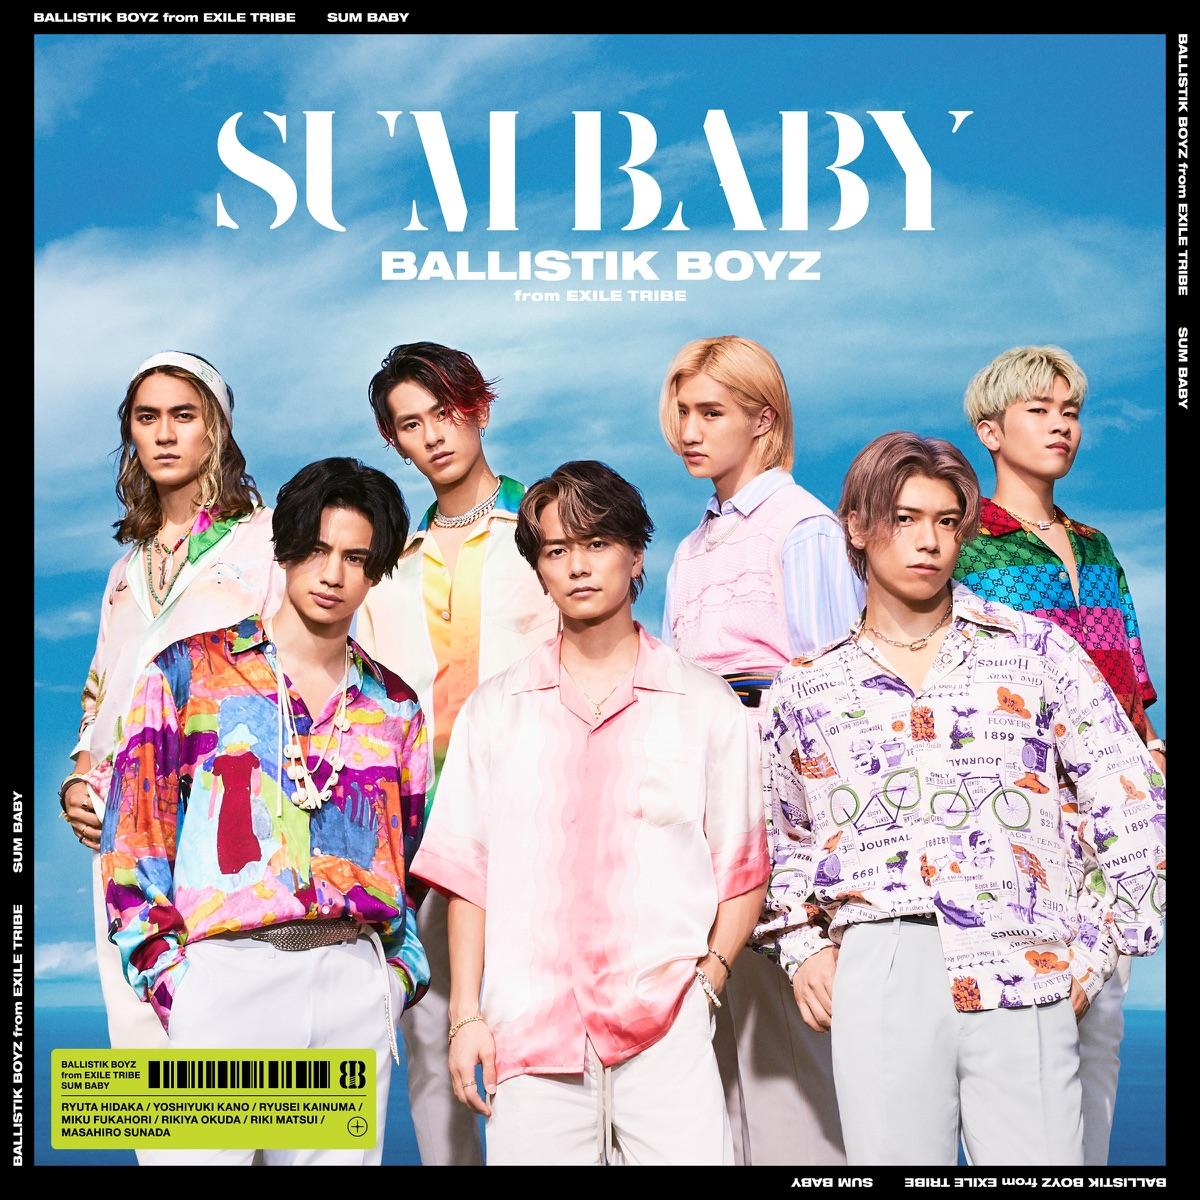 『BALLISTIK BOYZ from EXILE TRIBE - SUM BABY』収録の『SUM BABY』ジャケット